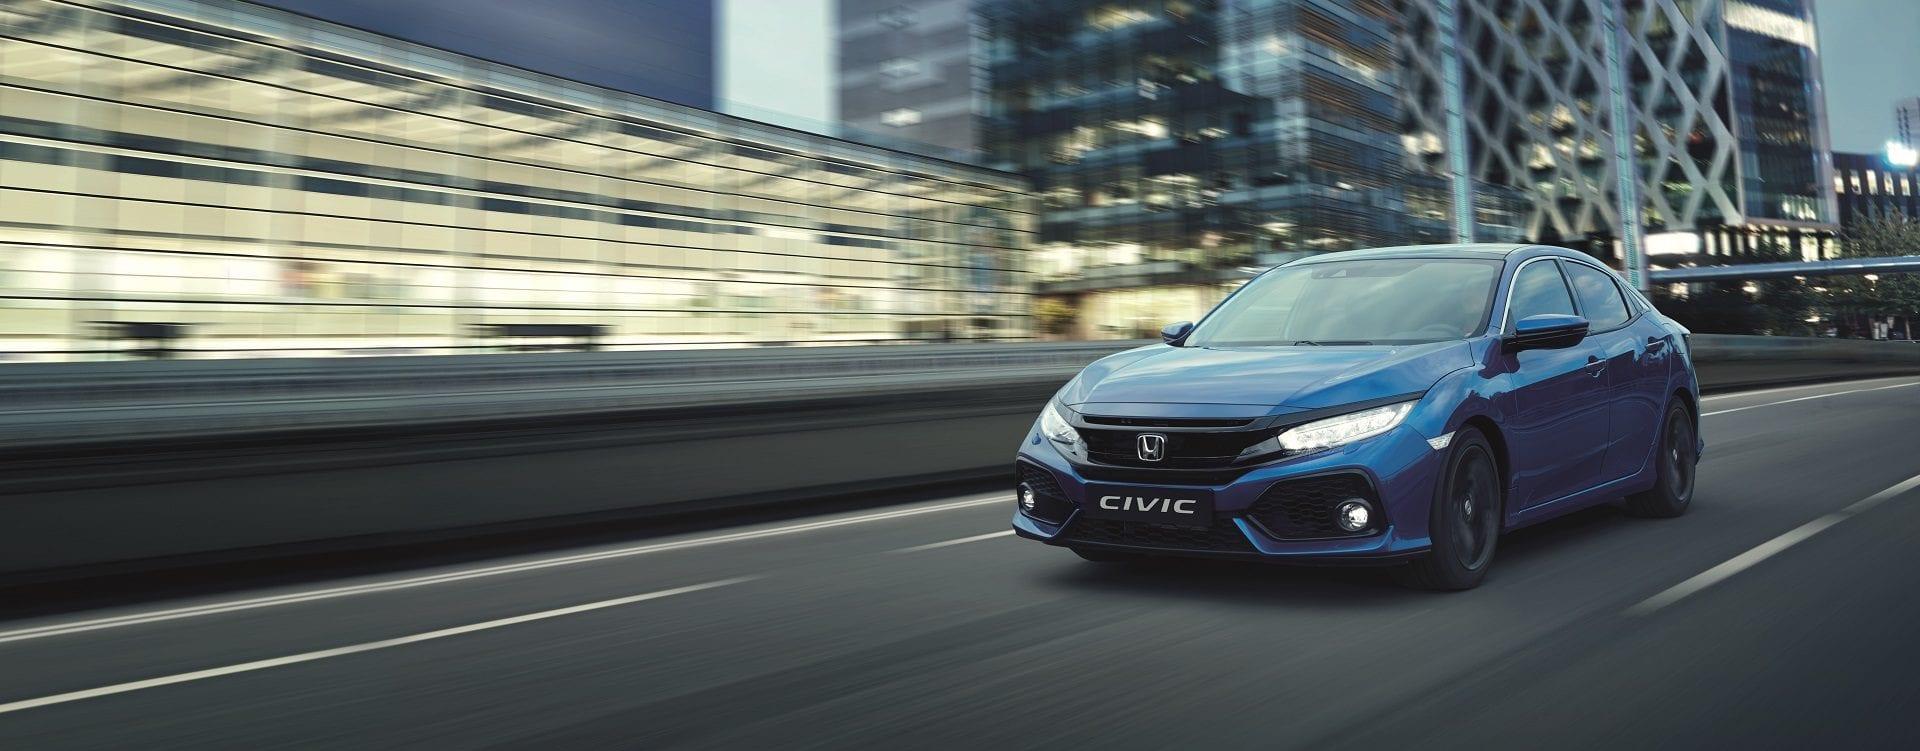 De Honda Civic 5-deurs Hatchback